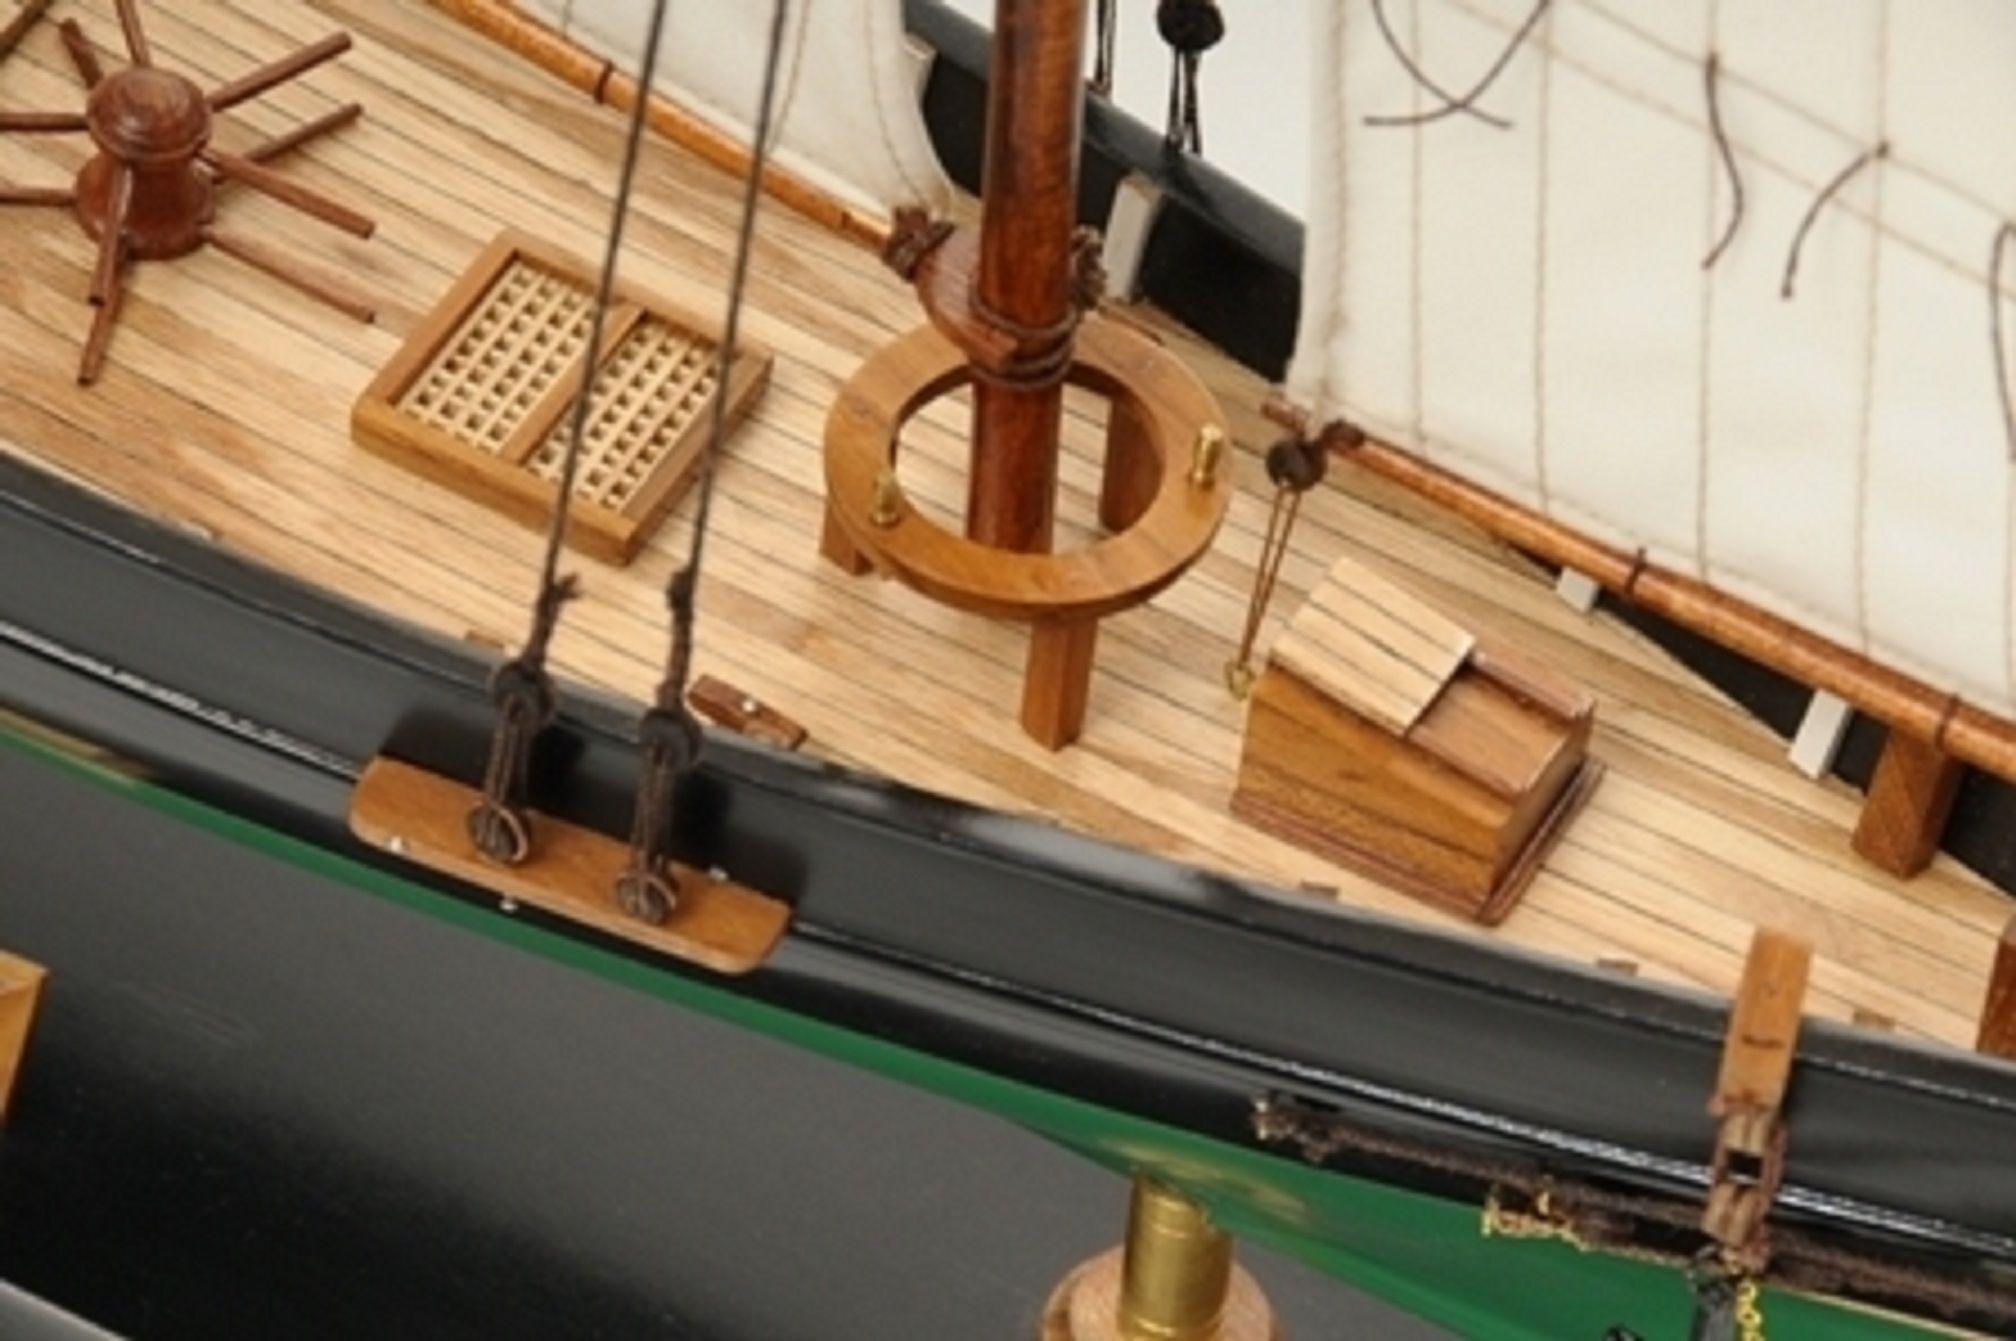 1419-7766-America-Model-Yacht-Superior-Range